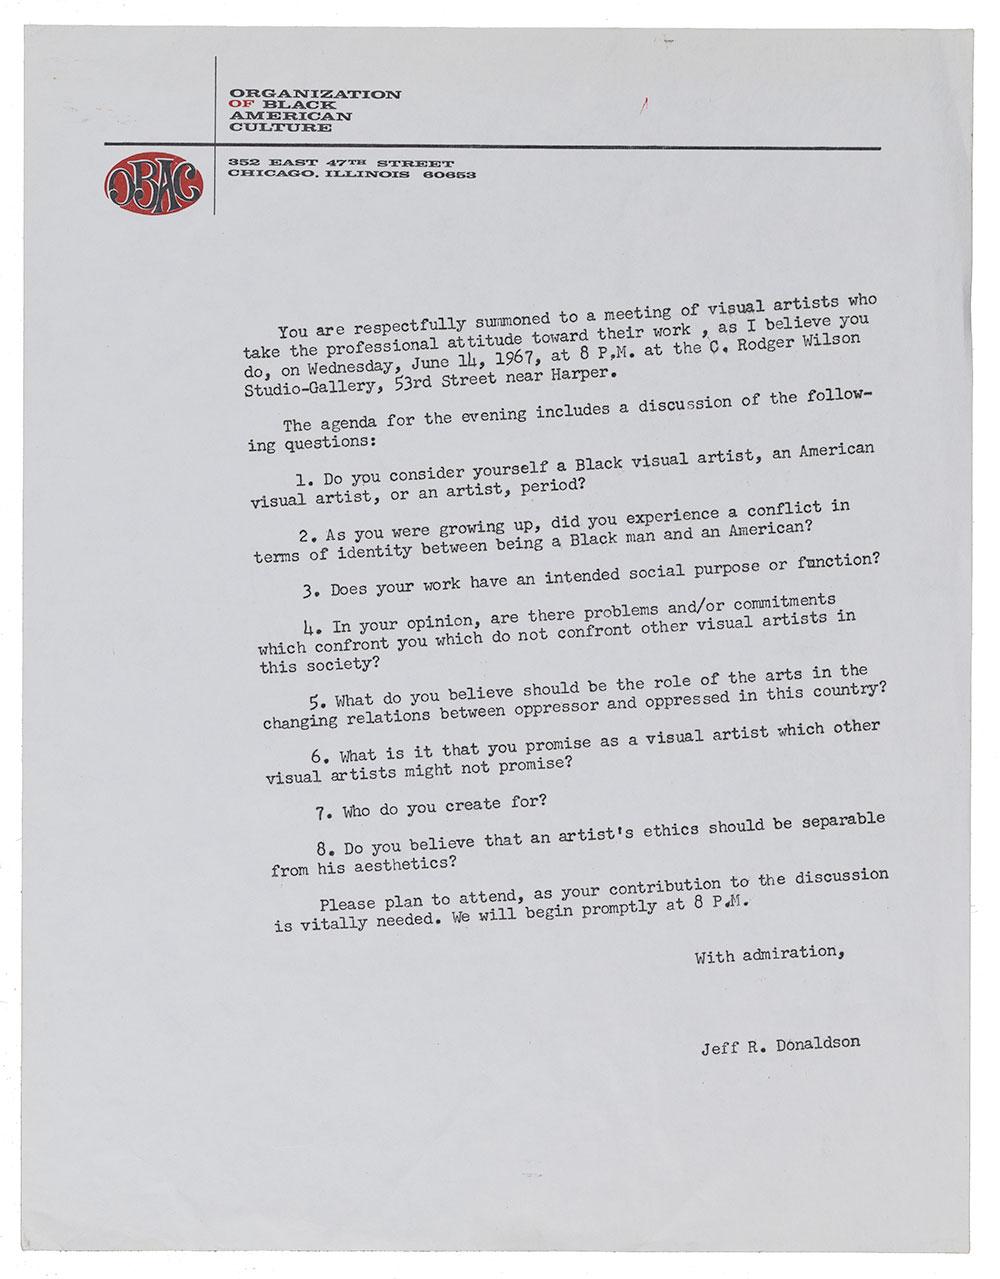 Blog acquisitions jeff donaldson papers archives of american jeff donaldson letter solutioingenieria Images